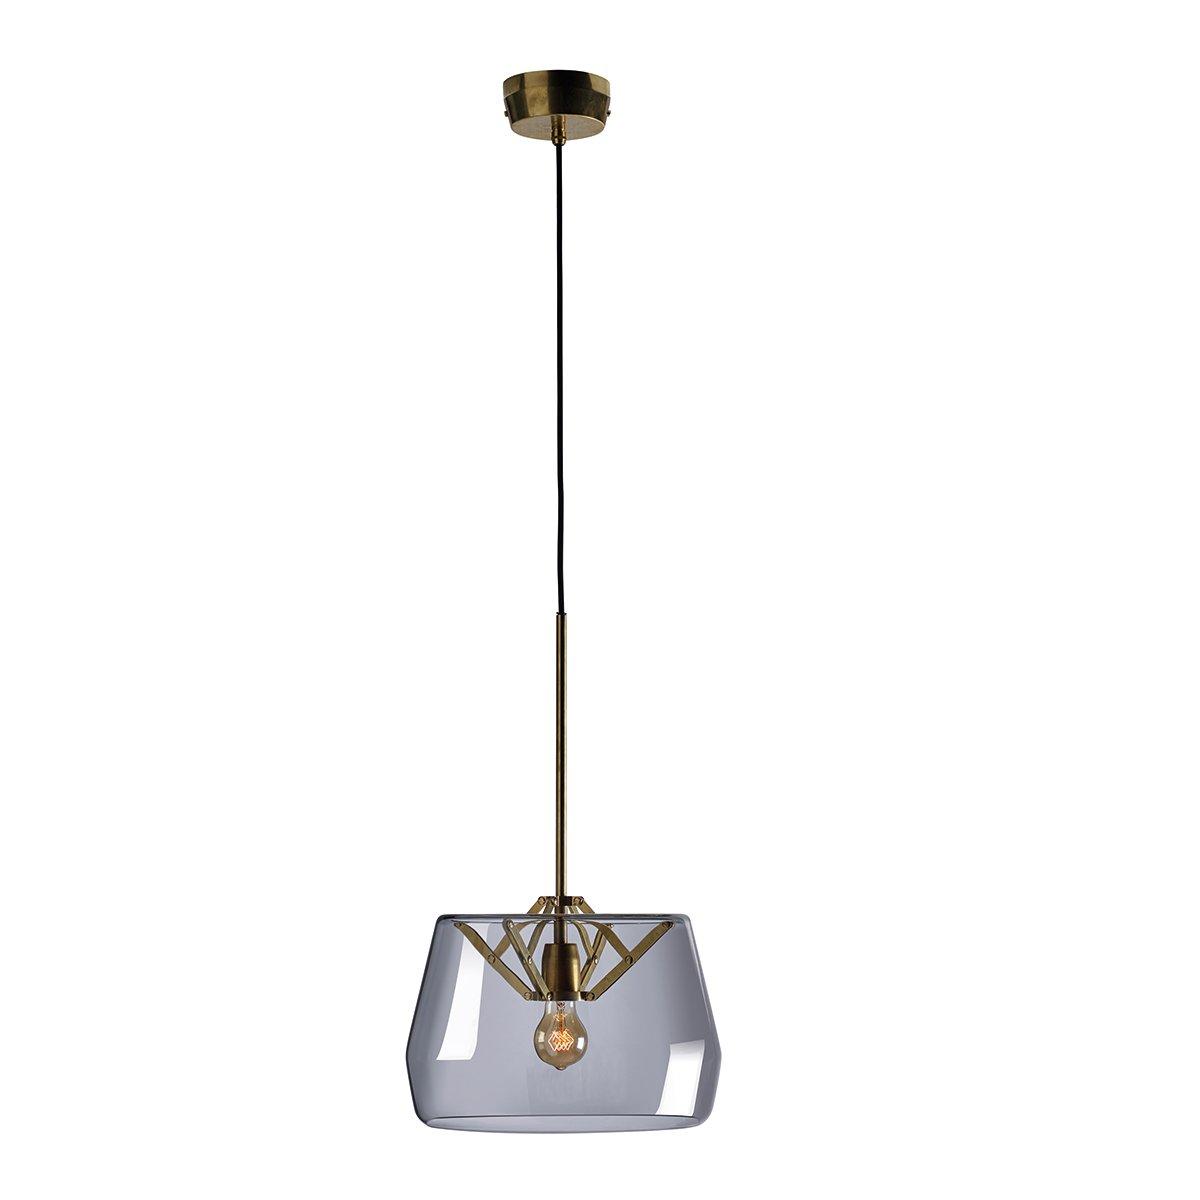 Tonone Atlas Hanglamp - Grijs Glas 35 cm.